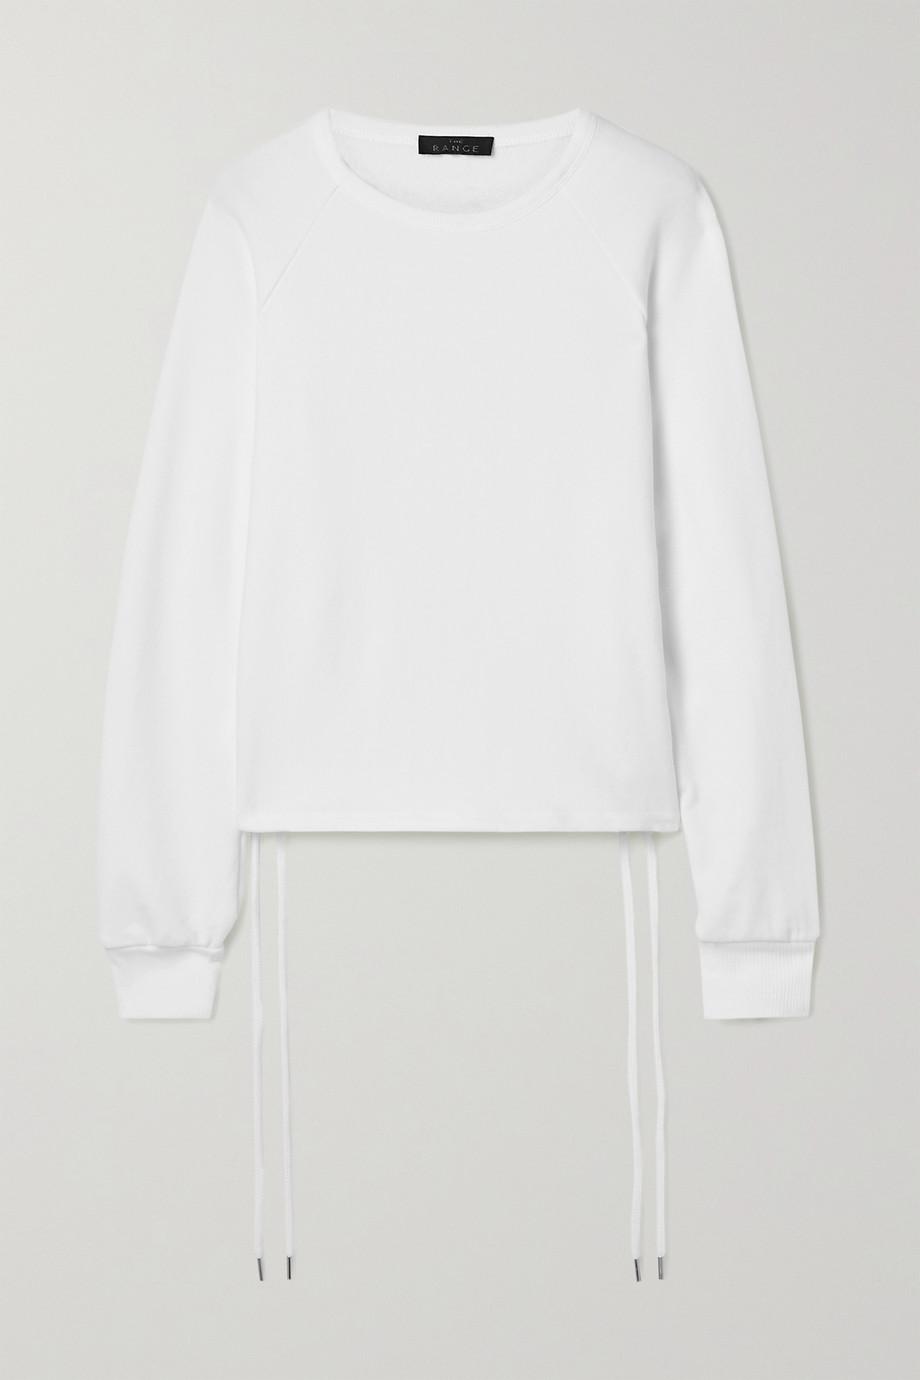 The Range Element stretch French cotton-terry sweatshirt